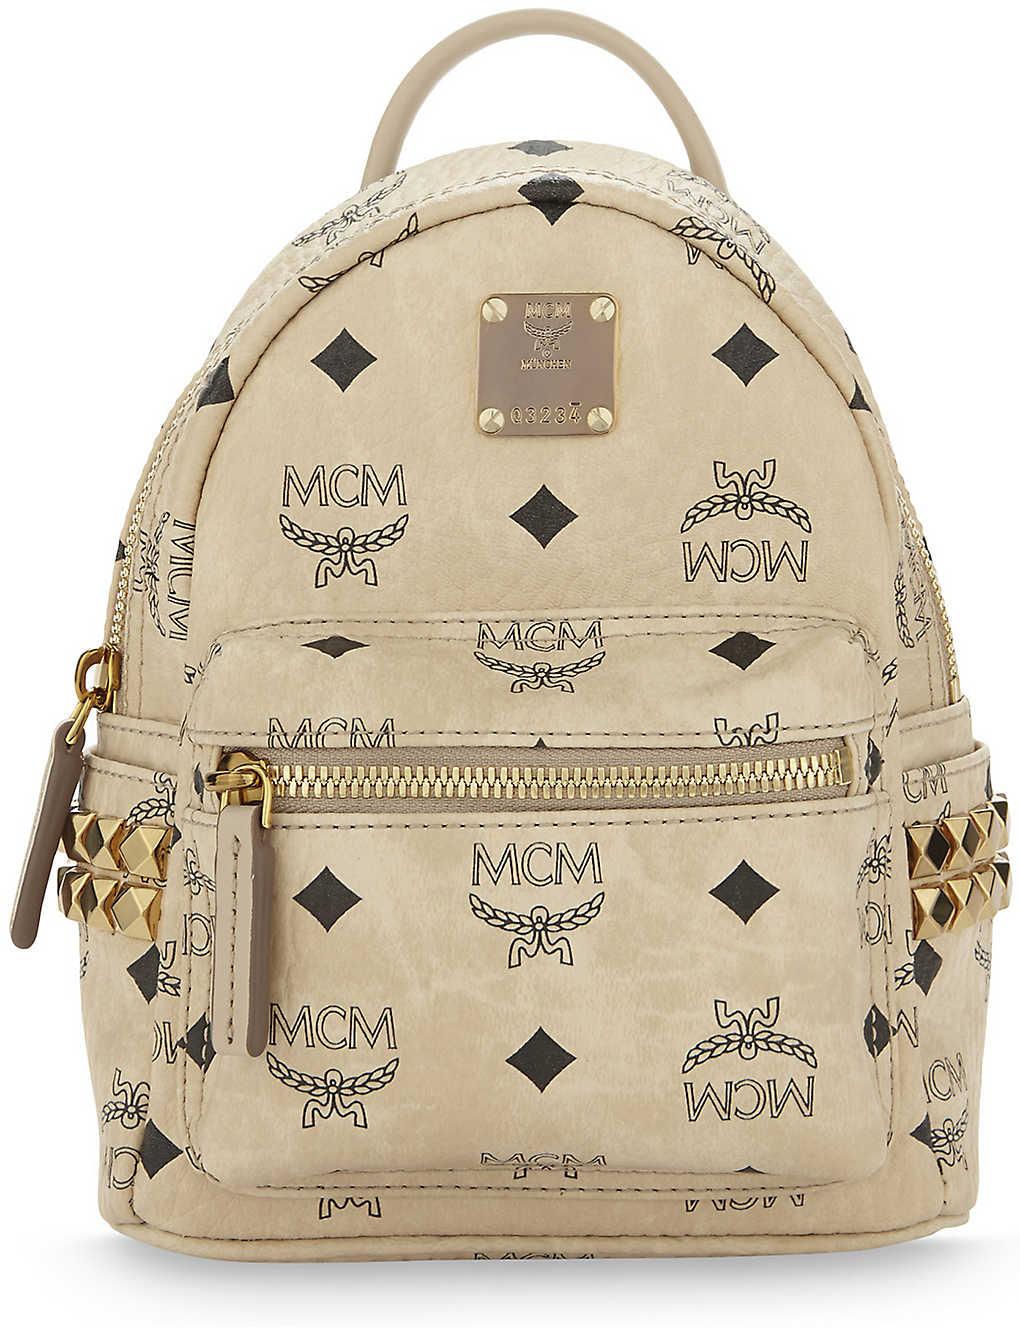 23c669d740029 MCM - Stark stud detail extra-mini backpack | Selfridges.com